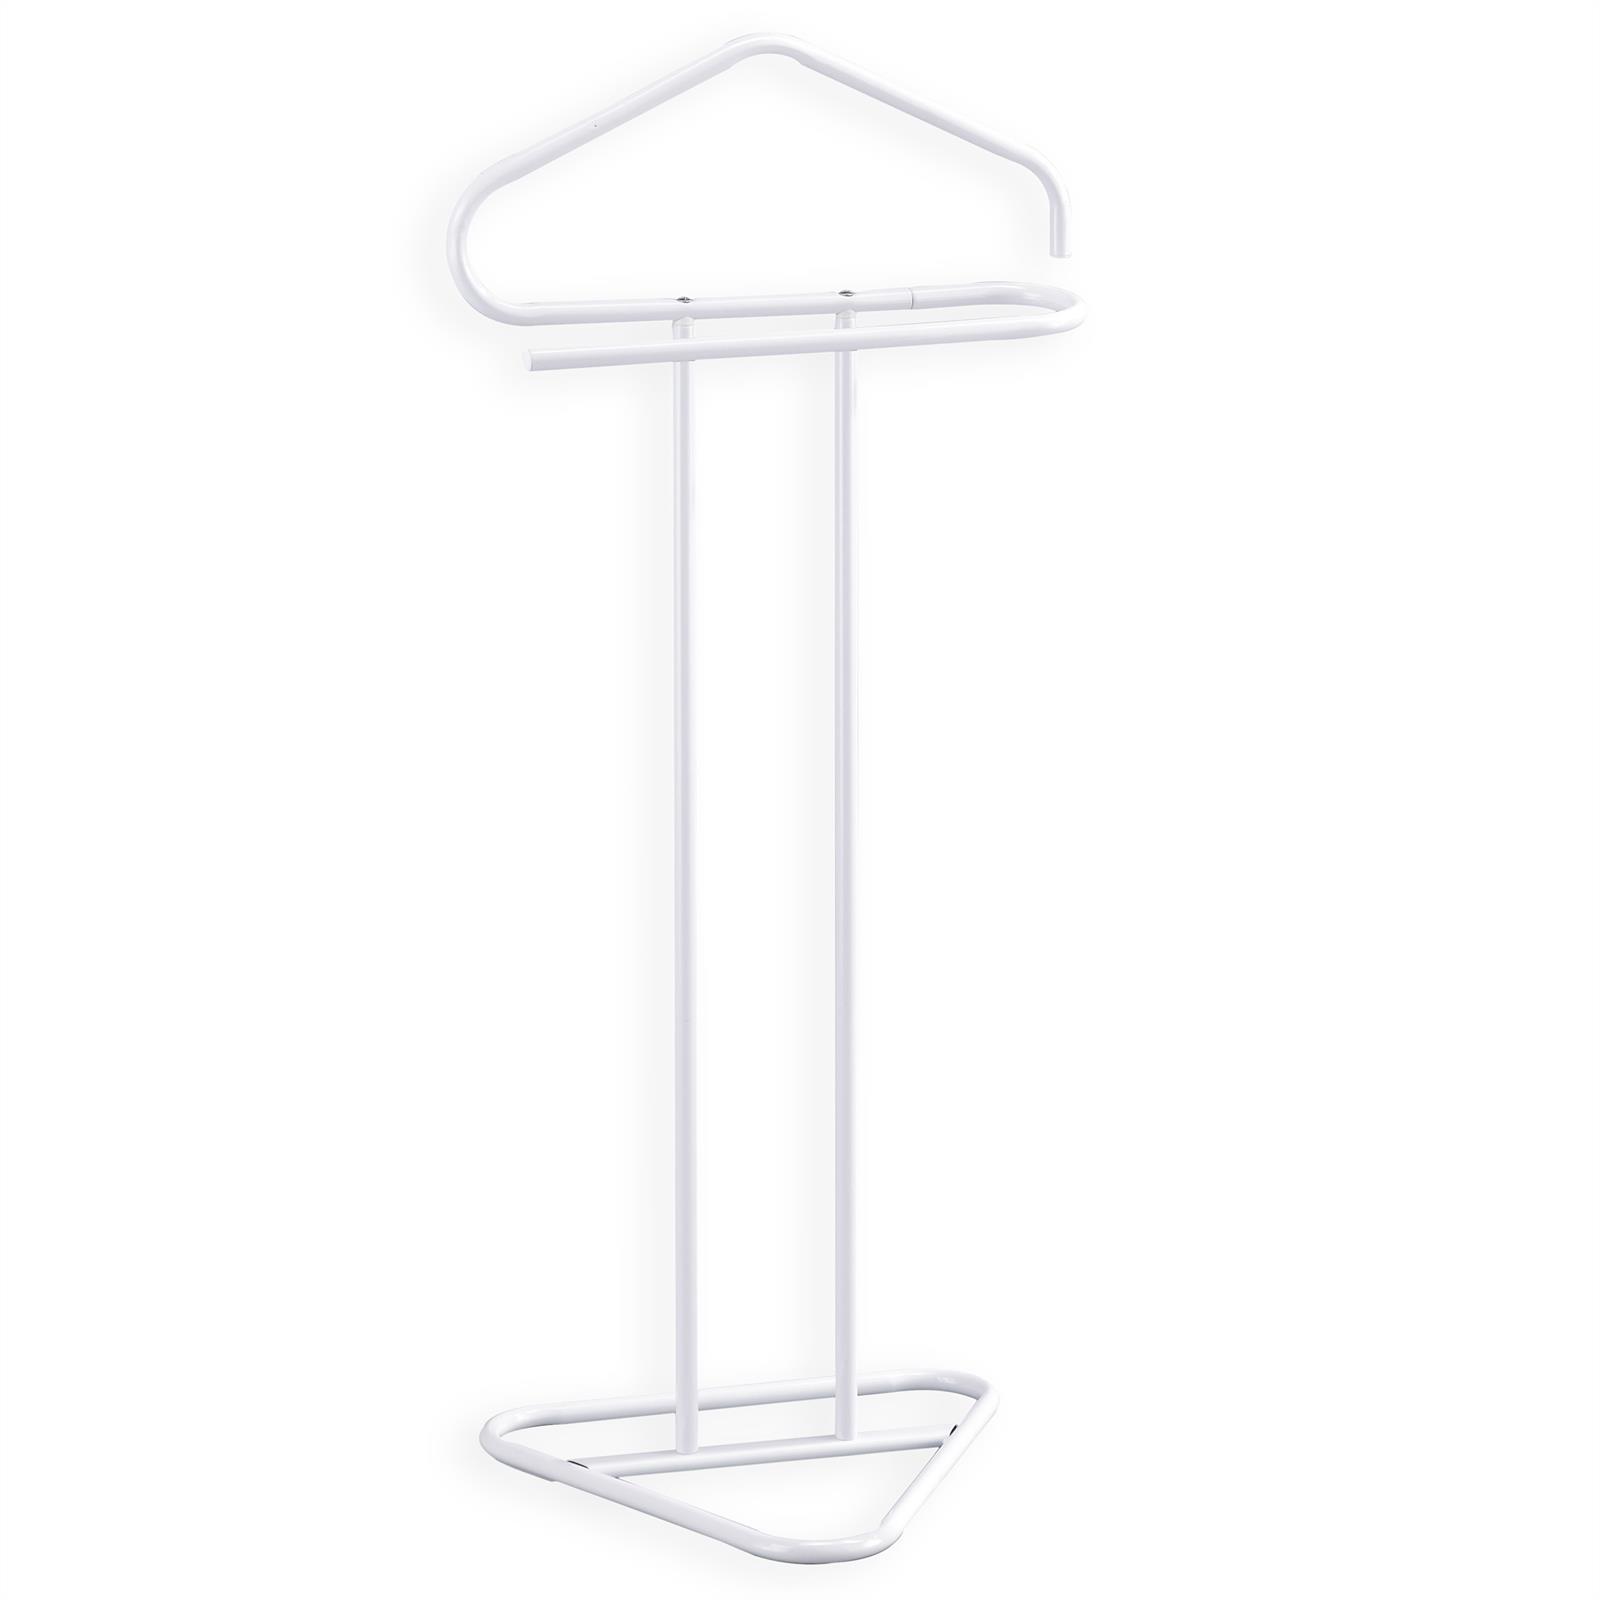 herrendiener stummer damen diener kleiderbutler kleiderst nde metall lackiert ebay. Black Bedroom Furniture Sets. Home Design Ideas